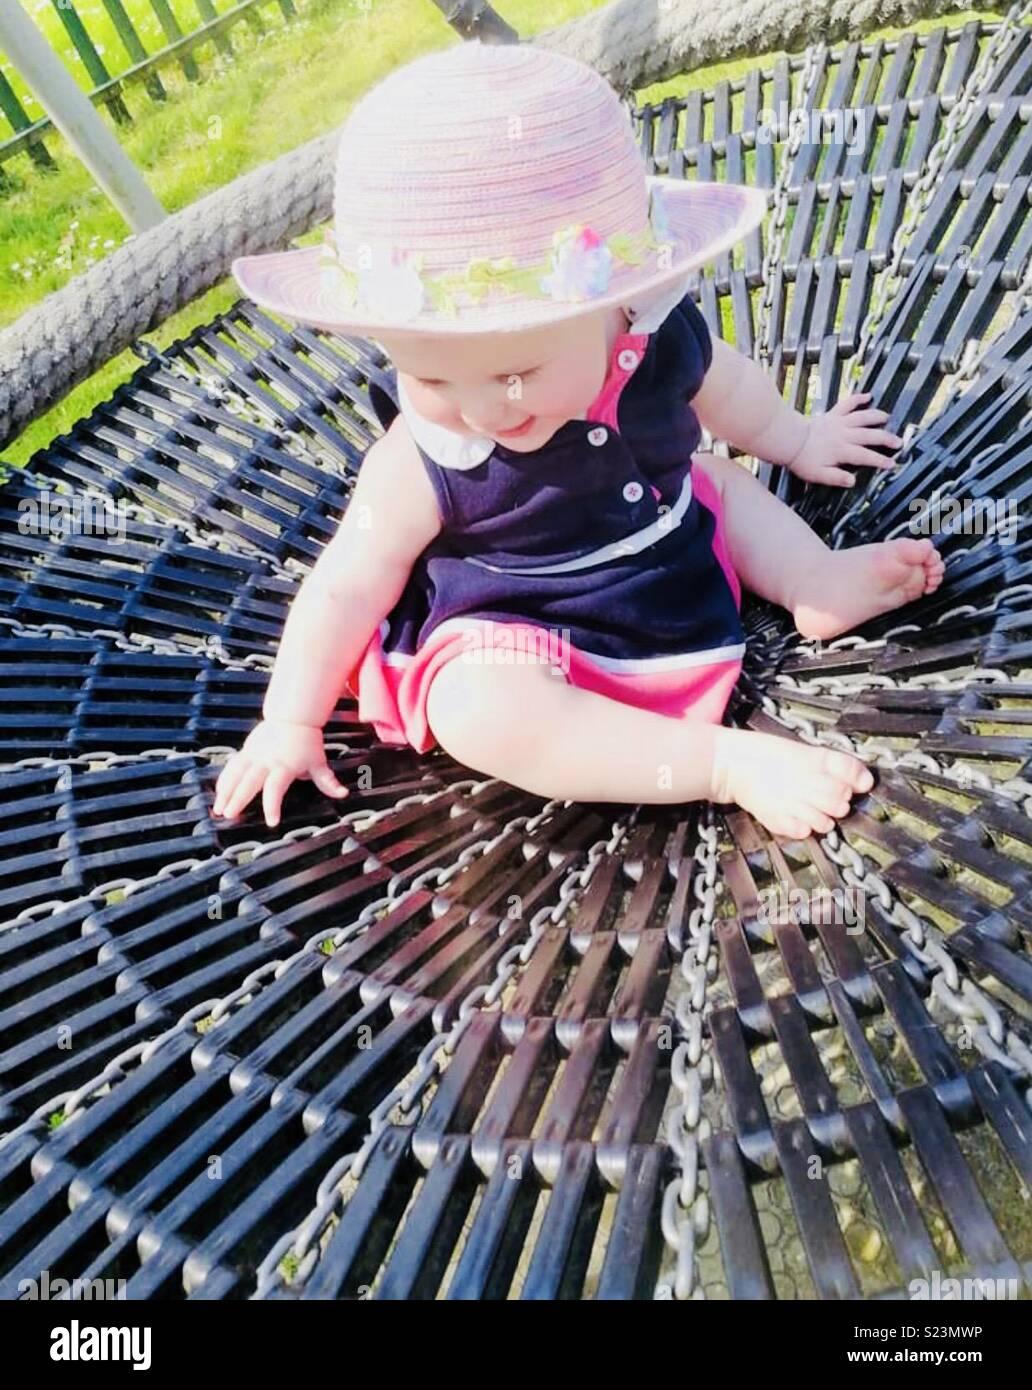 Sunday's, summer, outdoorsplay - Stock Image